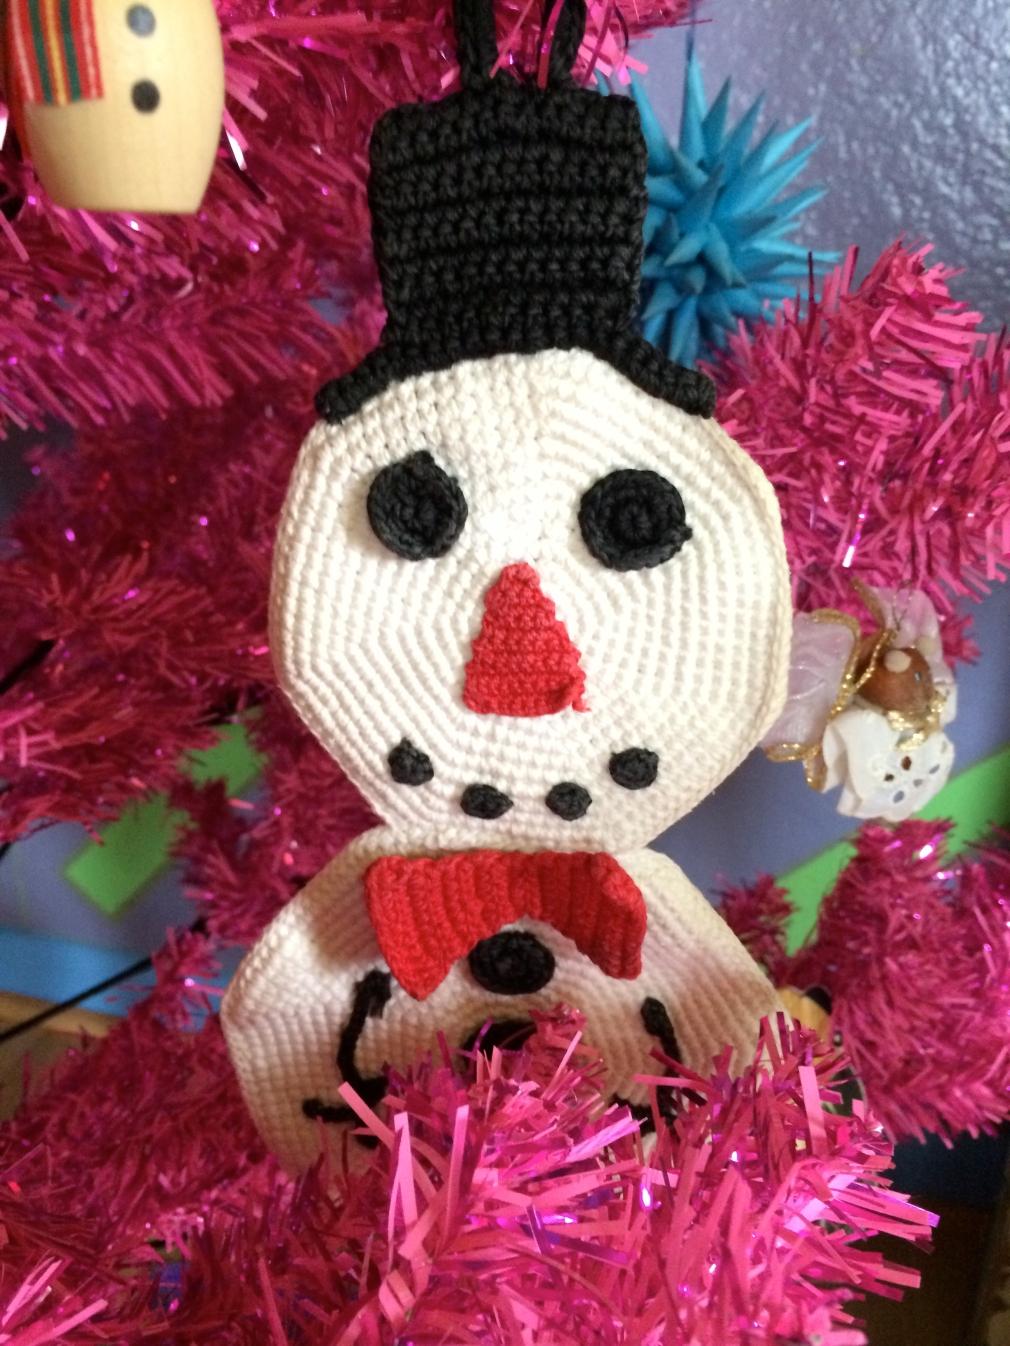 grandma murray's snowman